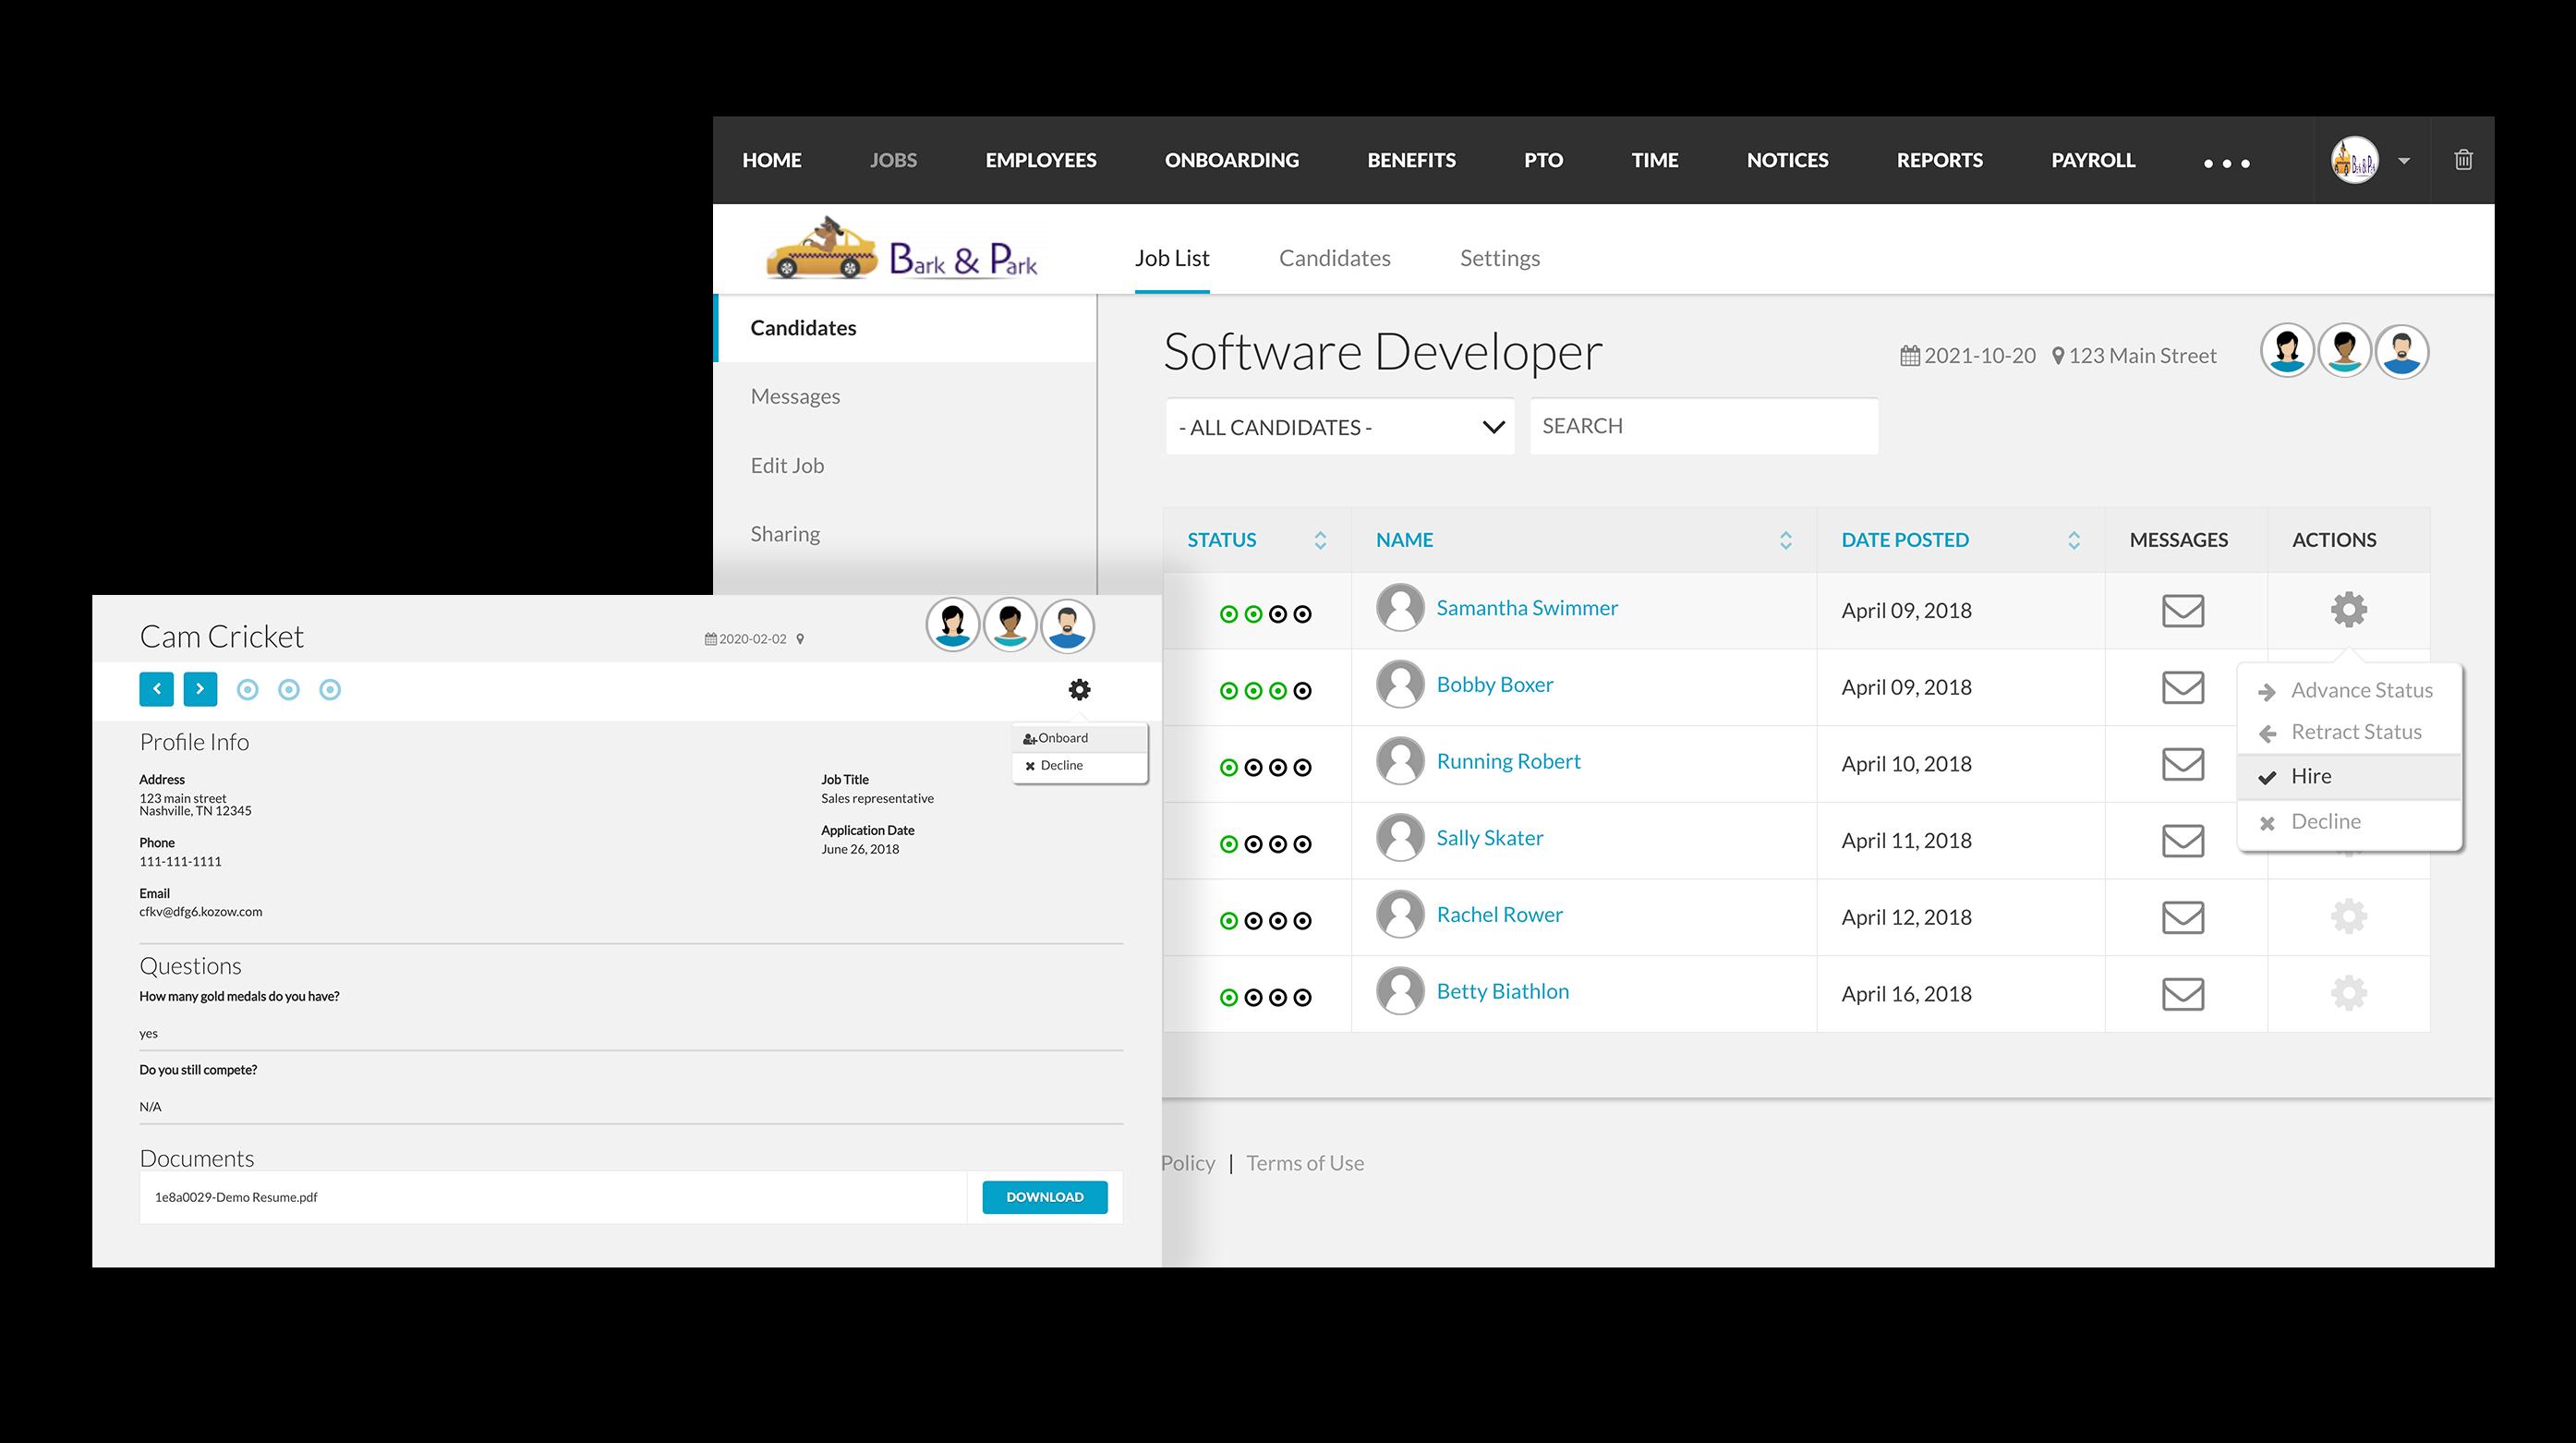 BerniePortal Software - Applicant tracking